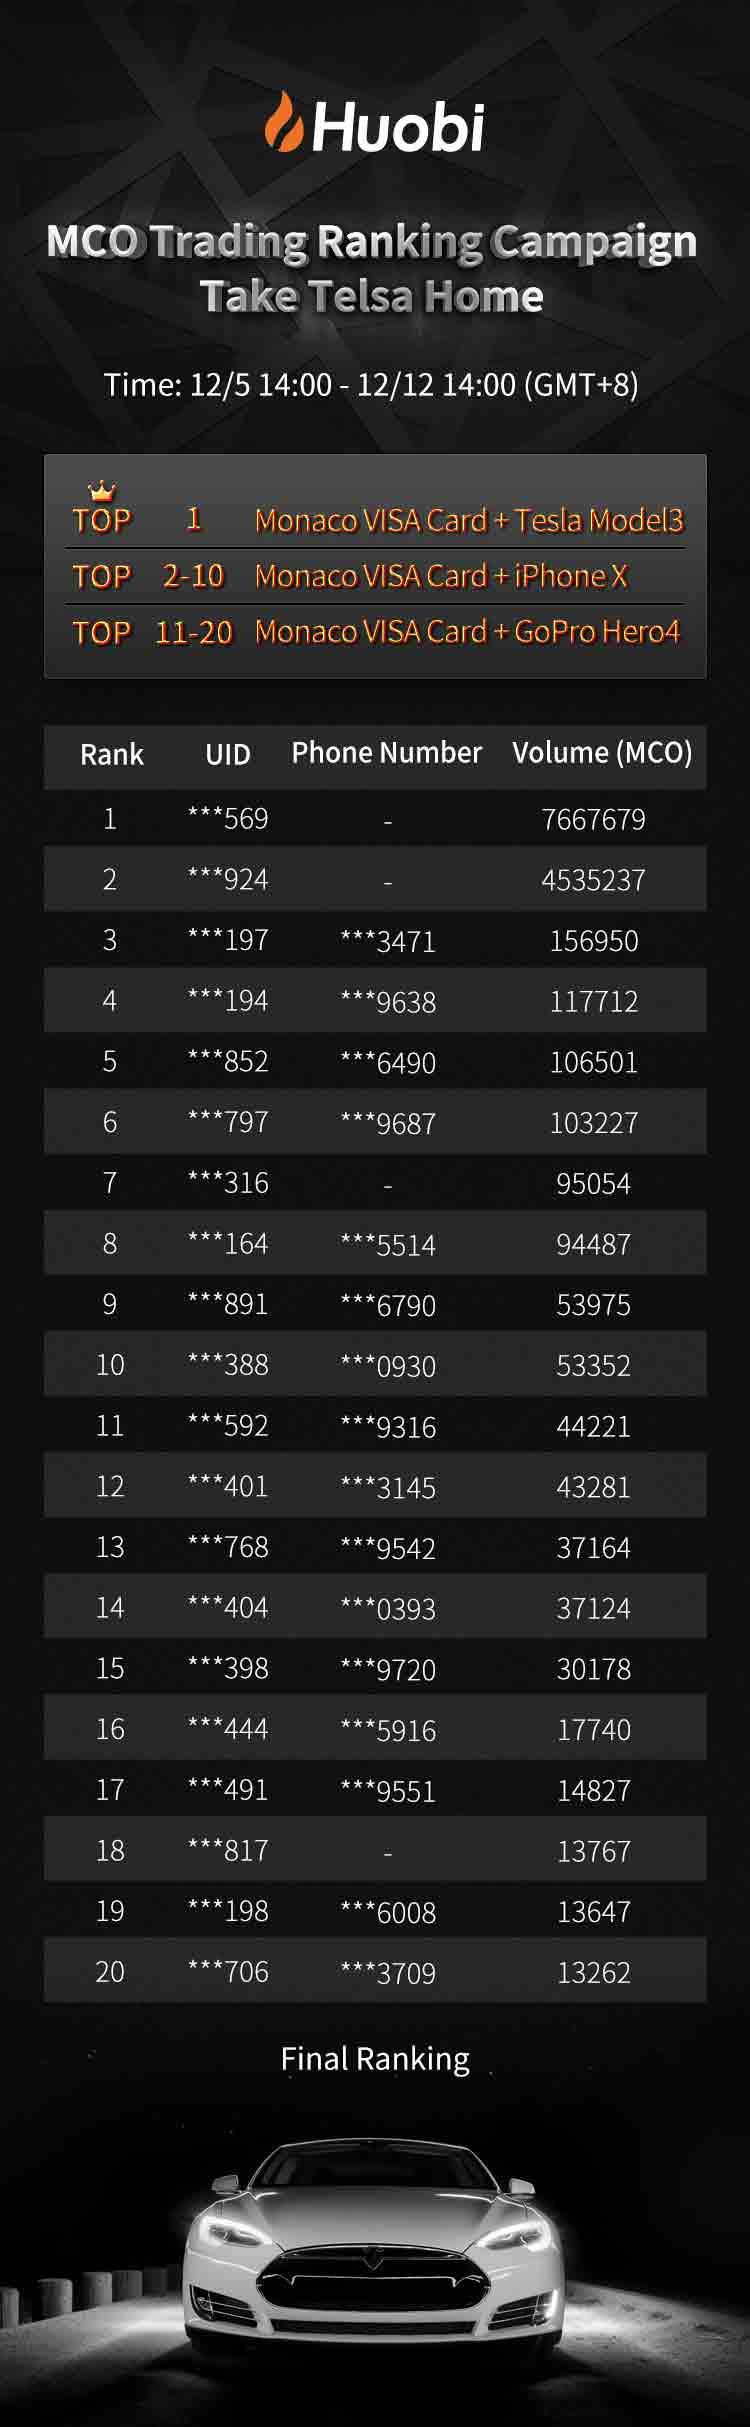 MCO交易排位赛长图-英文版-Final-Ranking.jpg